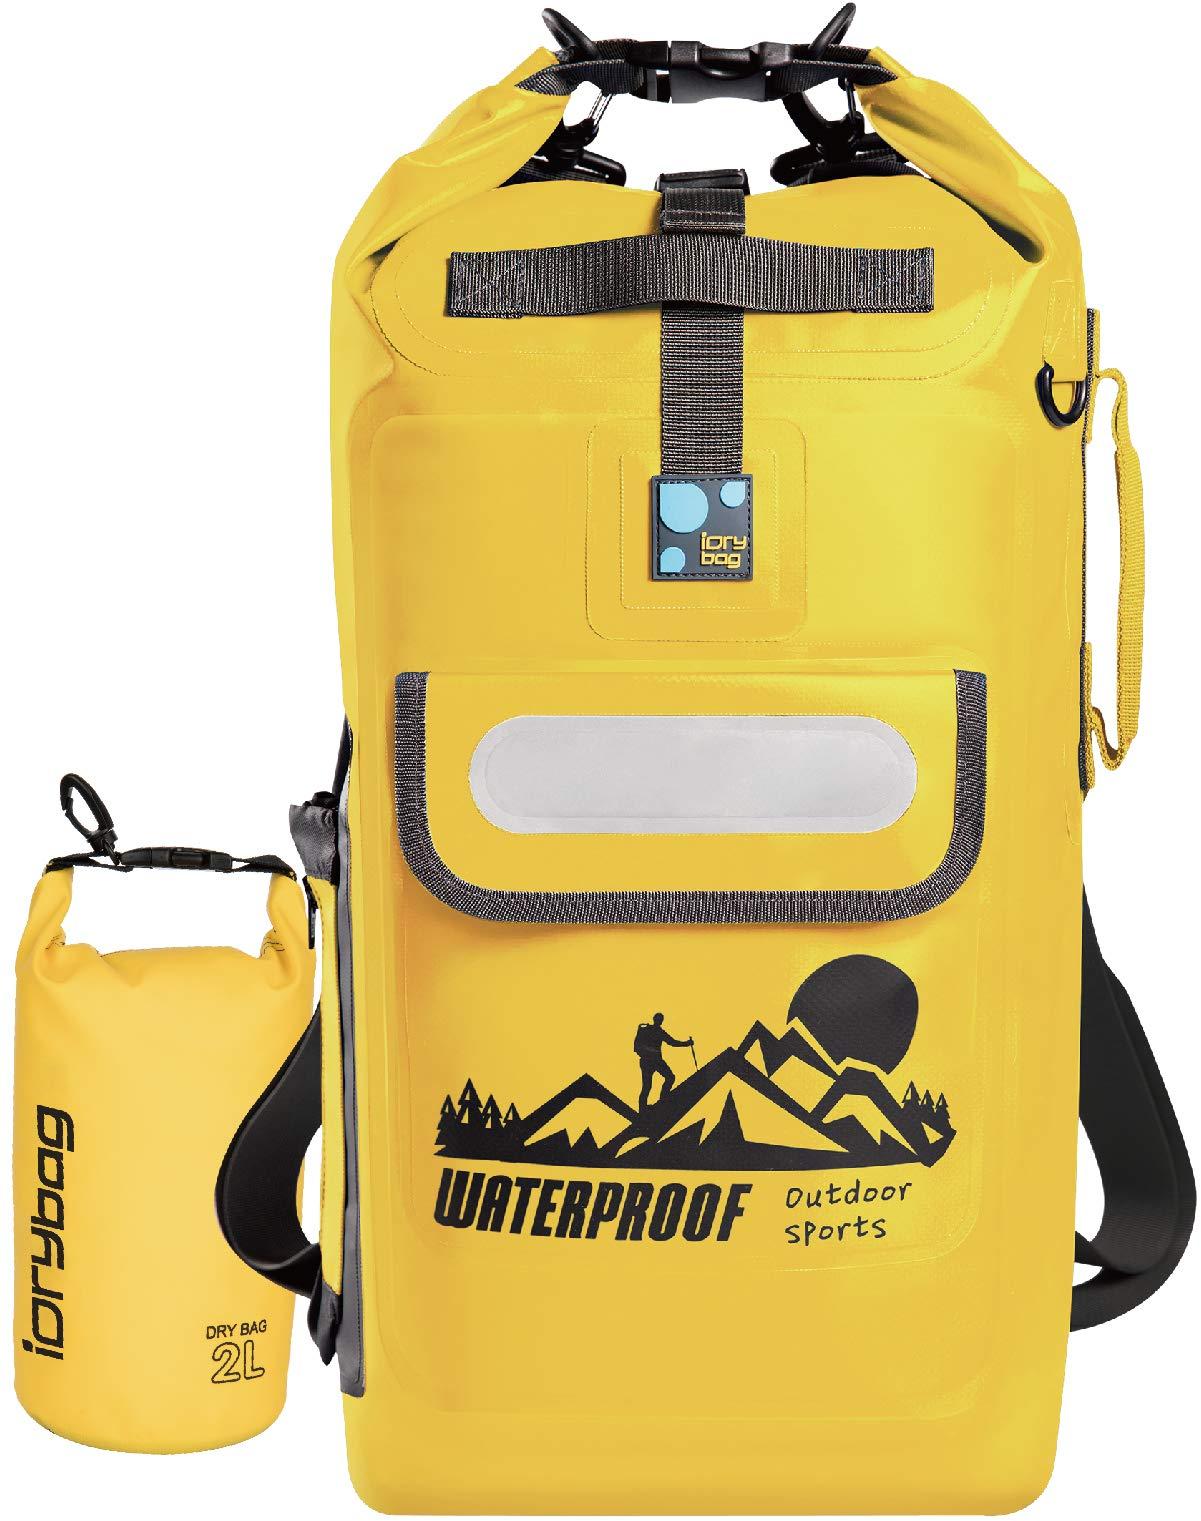 IDRYBAG Waterproof Backpack Floating Dry Bag, Dry Bag Backpack Waterproof 20L, Roll Top Keeps Gear Dry for Kayaking, Boating, Rafting, Fishing, Swimming, Hiking, Camping, Travel, Beach by IDRYBAG